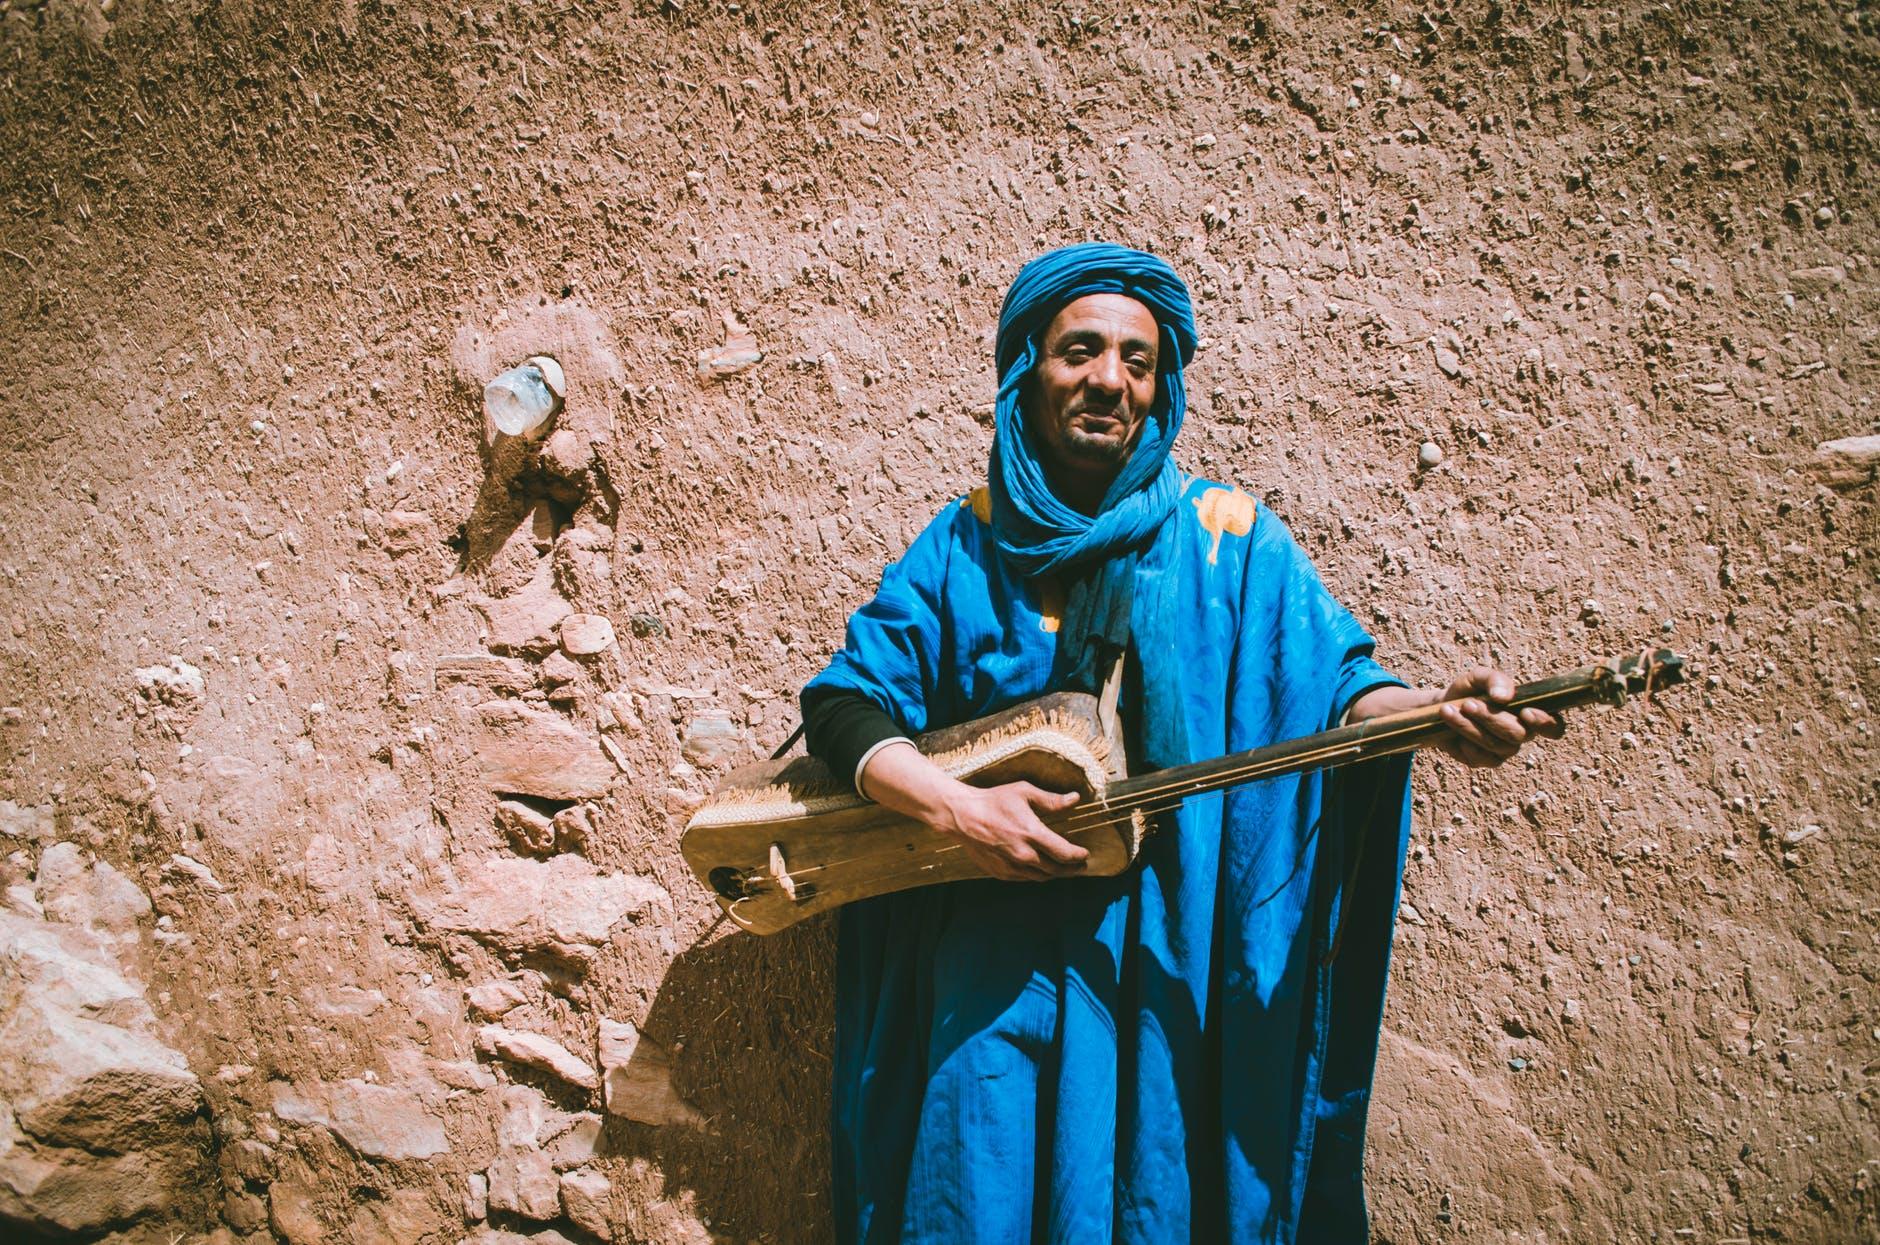 Morocco wallpaper